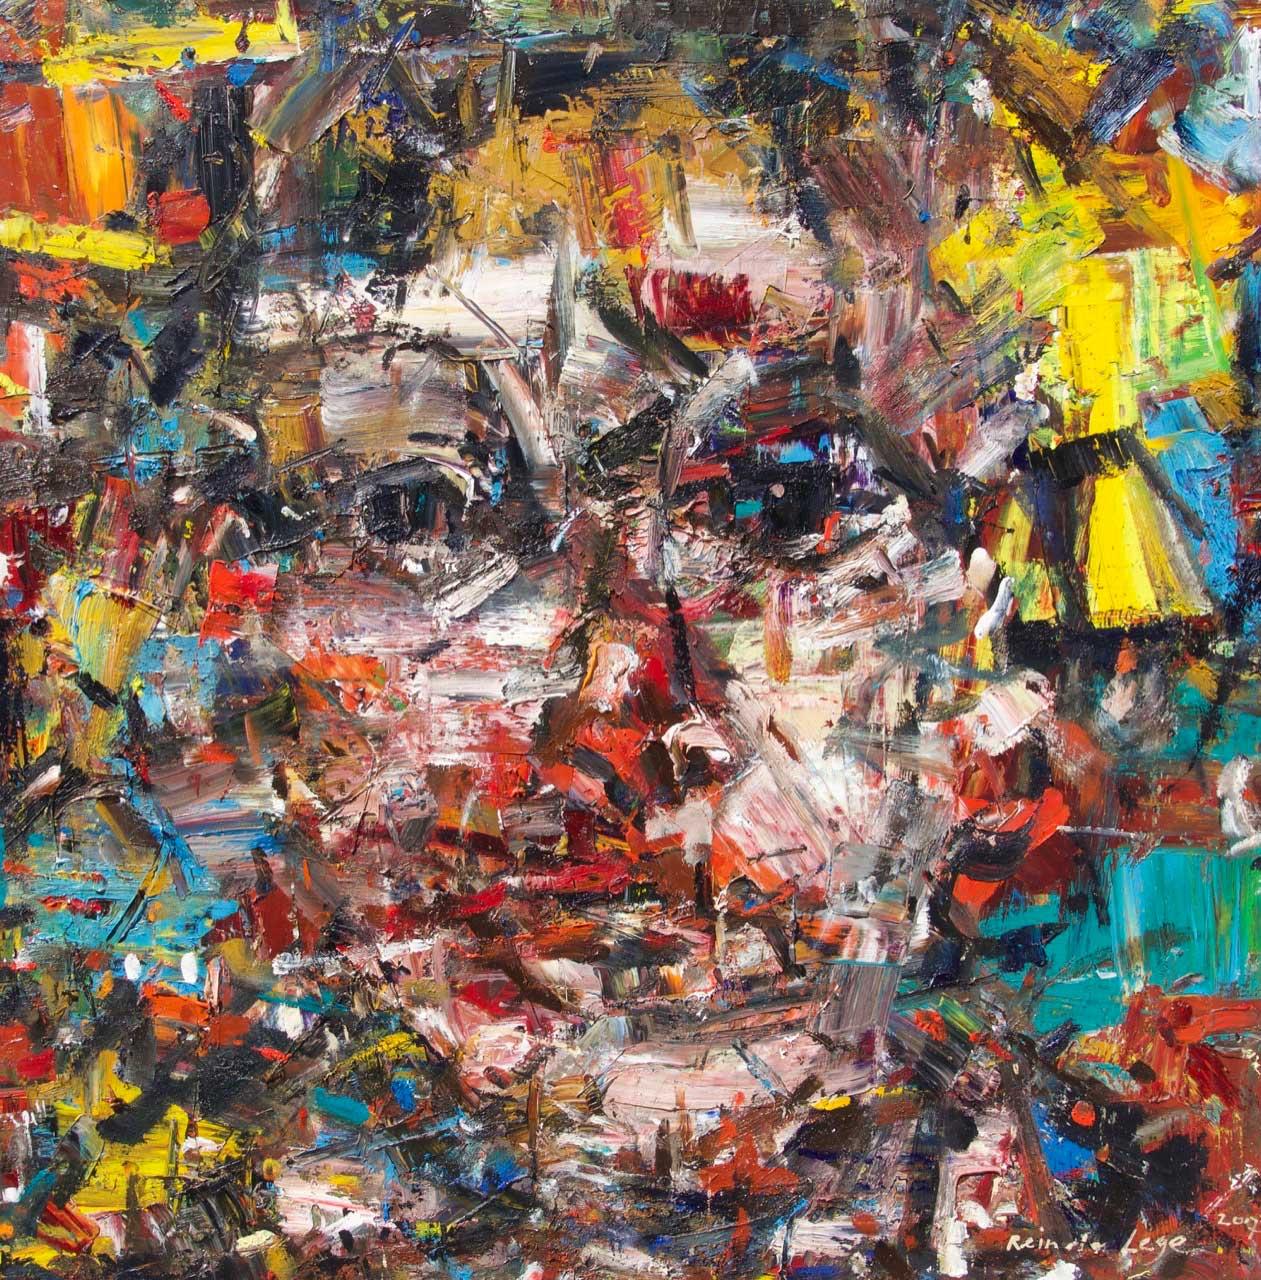 2017 Oil on canvas 100/100 cm.